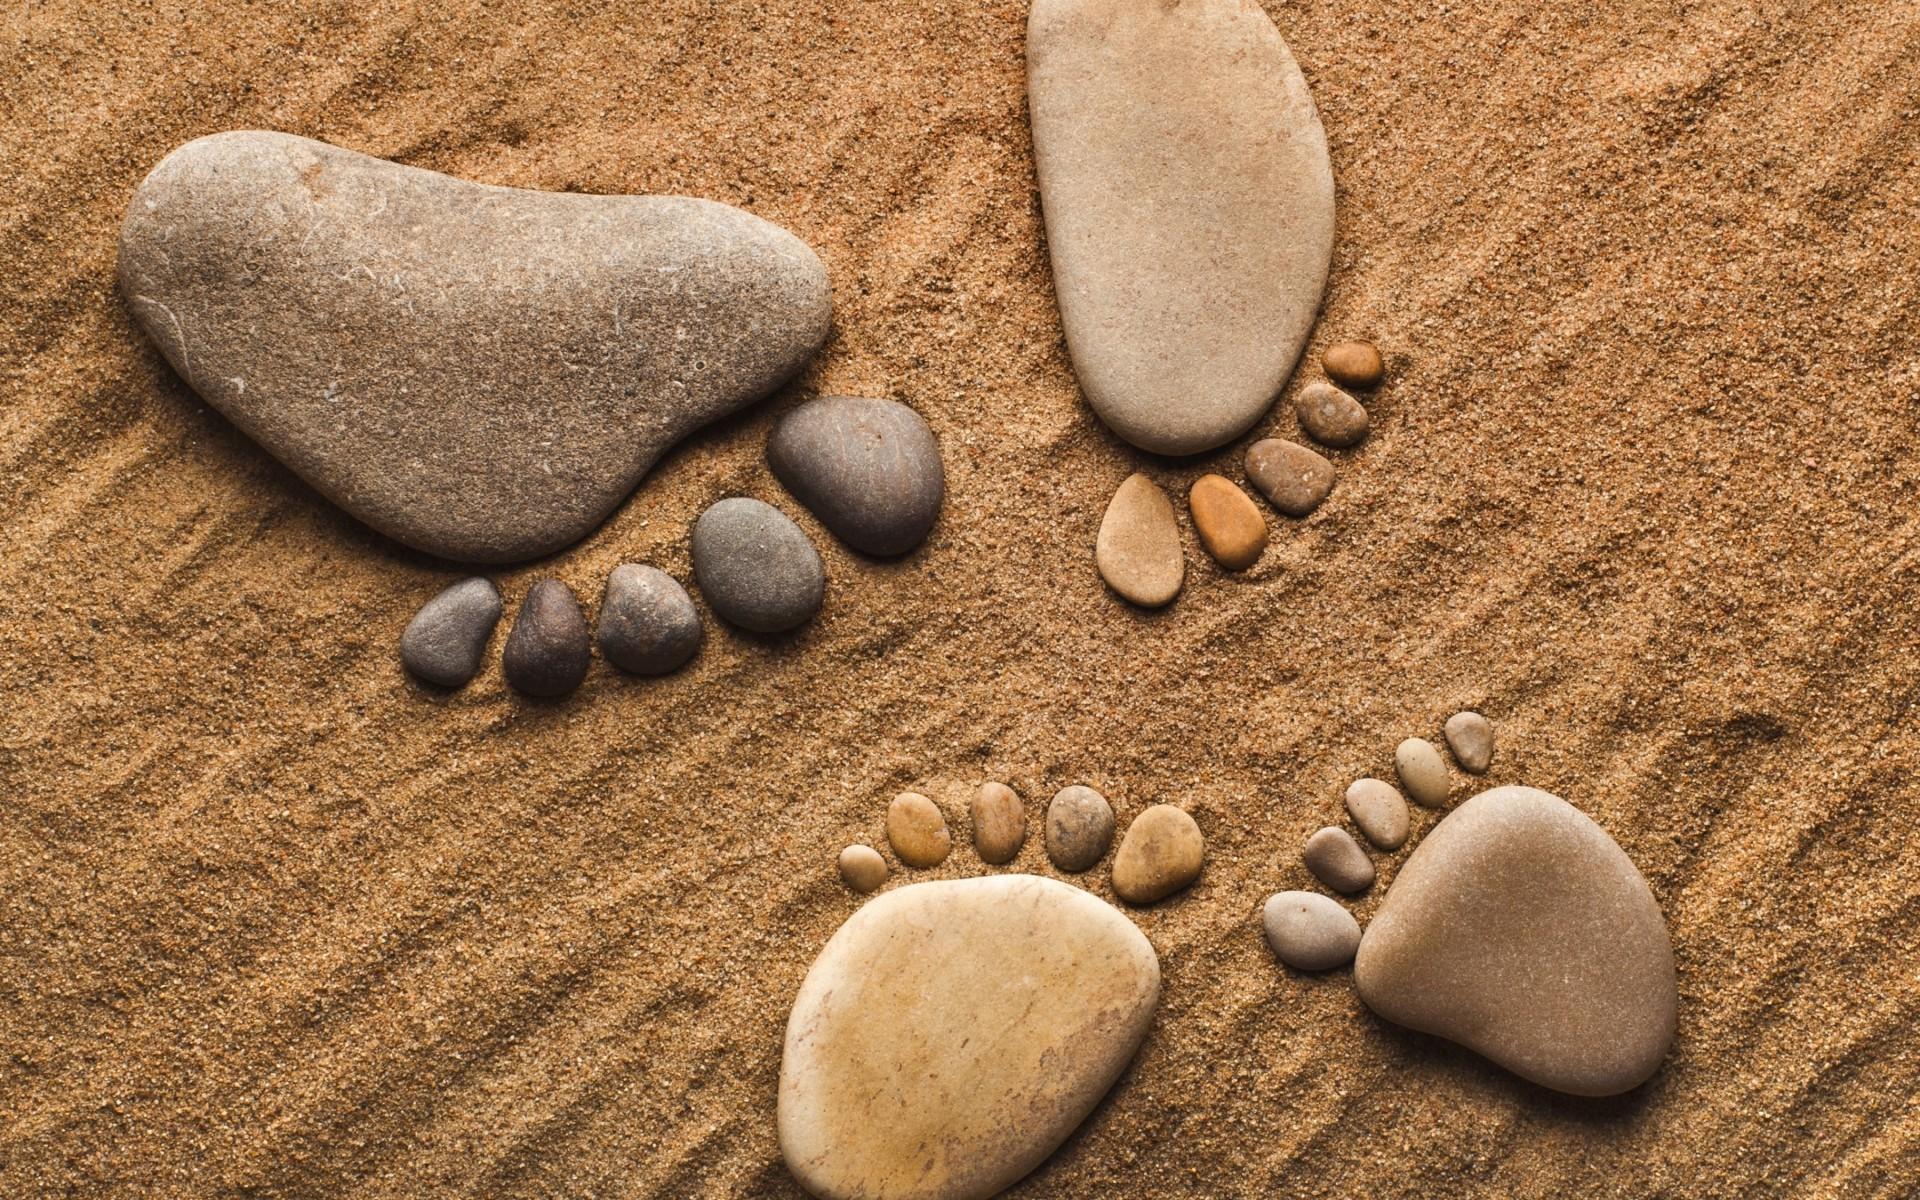 Rocks stones pebbles feet legs feet sand hang ten bokek ...